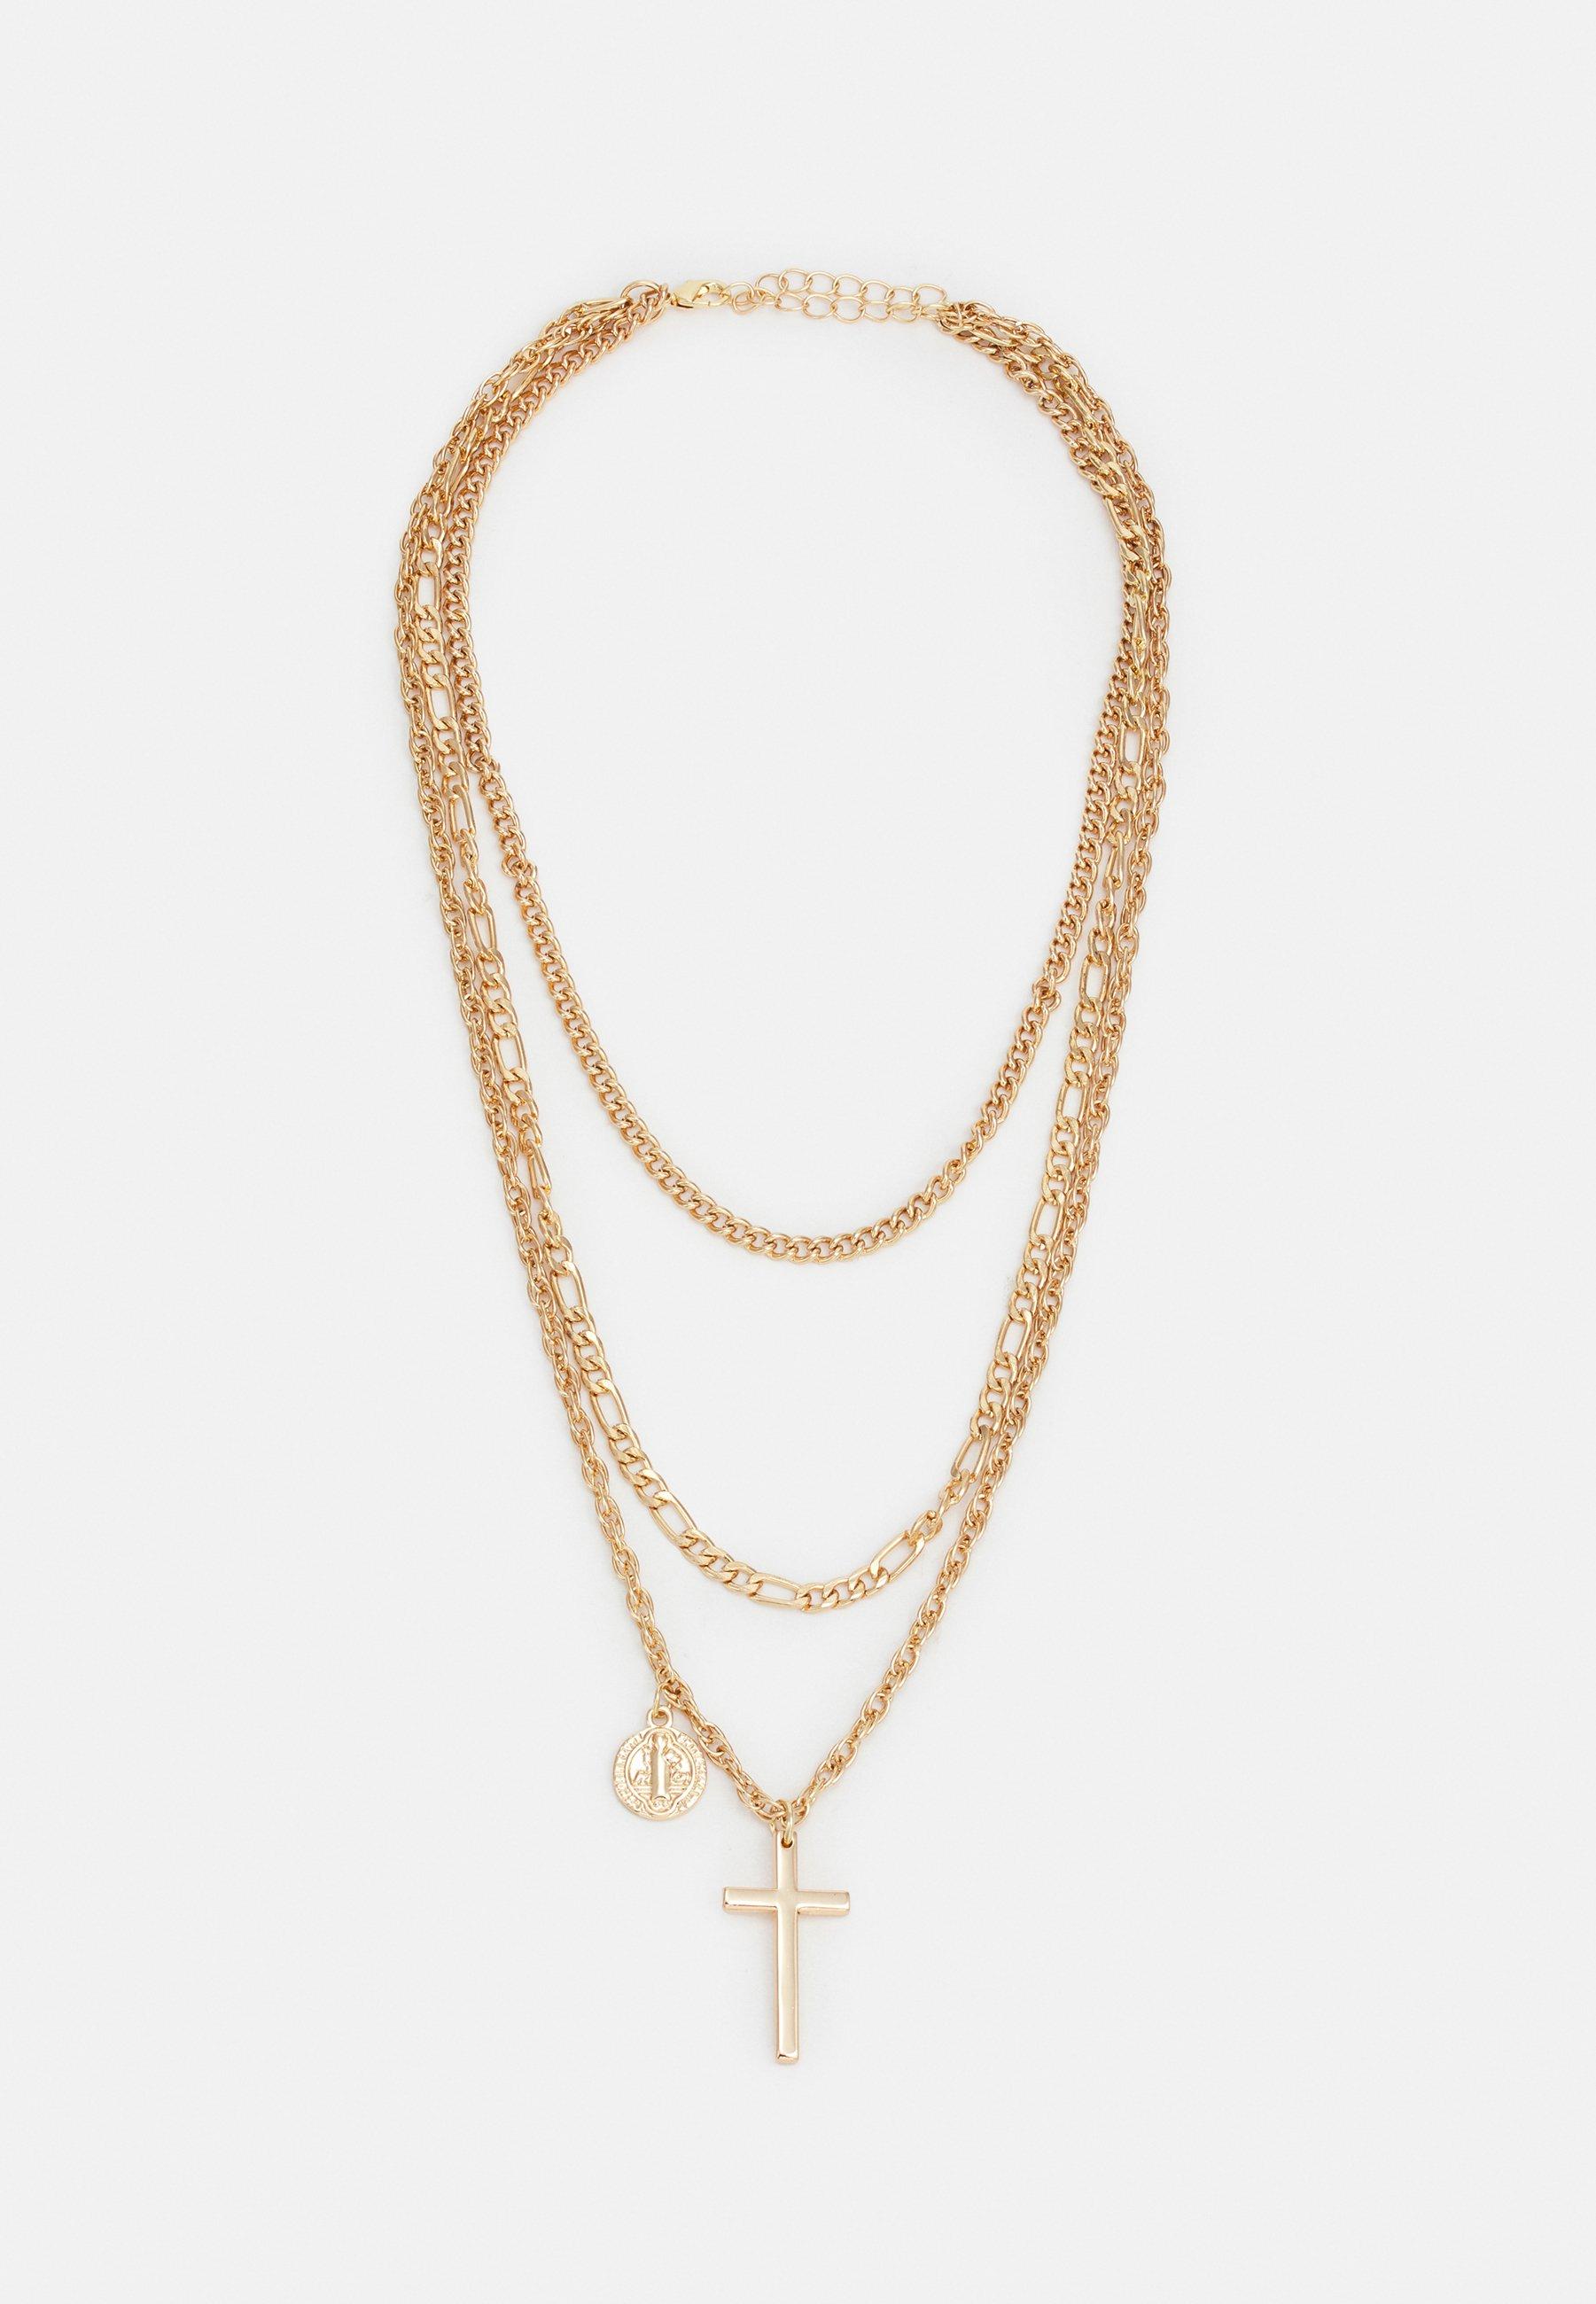 Damen MINI COIN CROSS NECKLACE UNISEX - Halskette